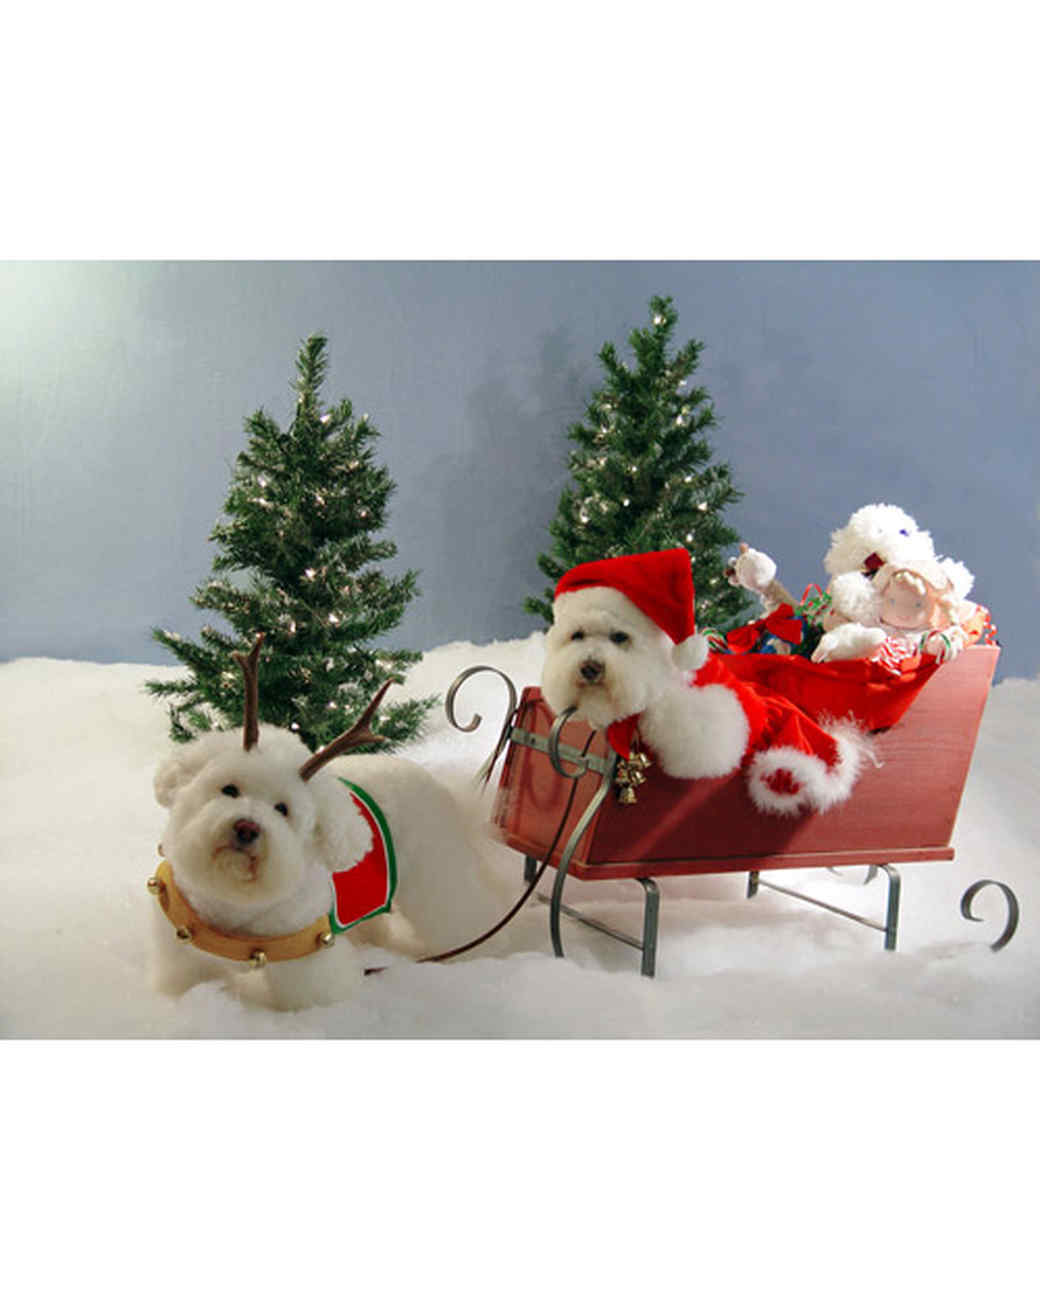 pets_santa09_6963252_18772096_main.jpg